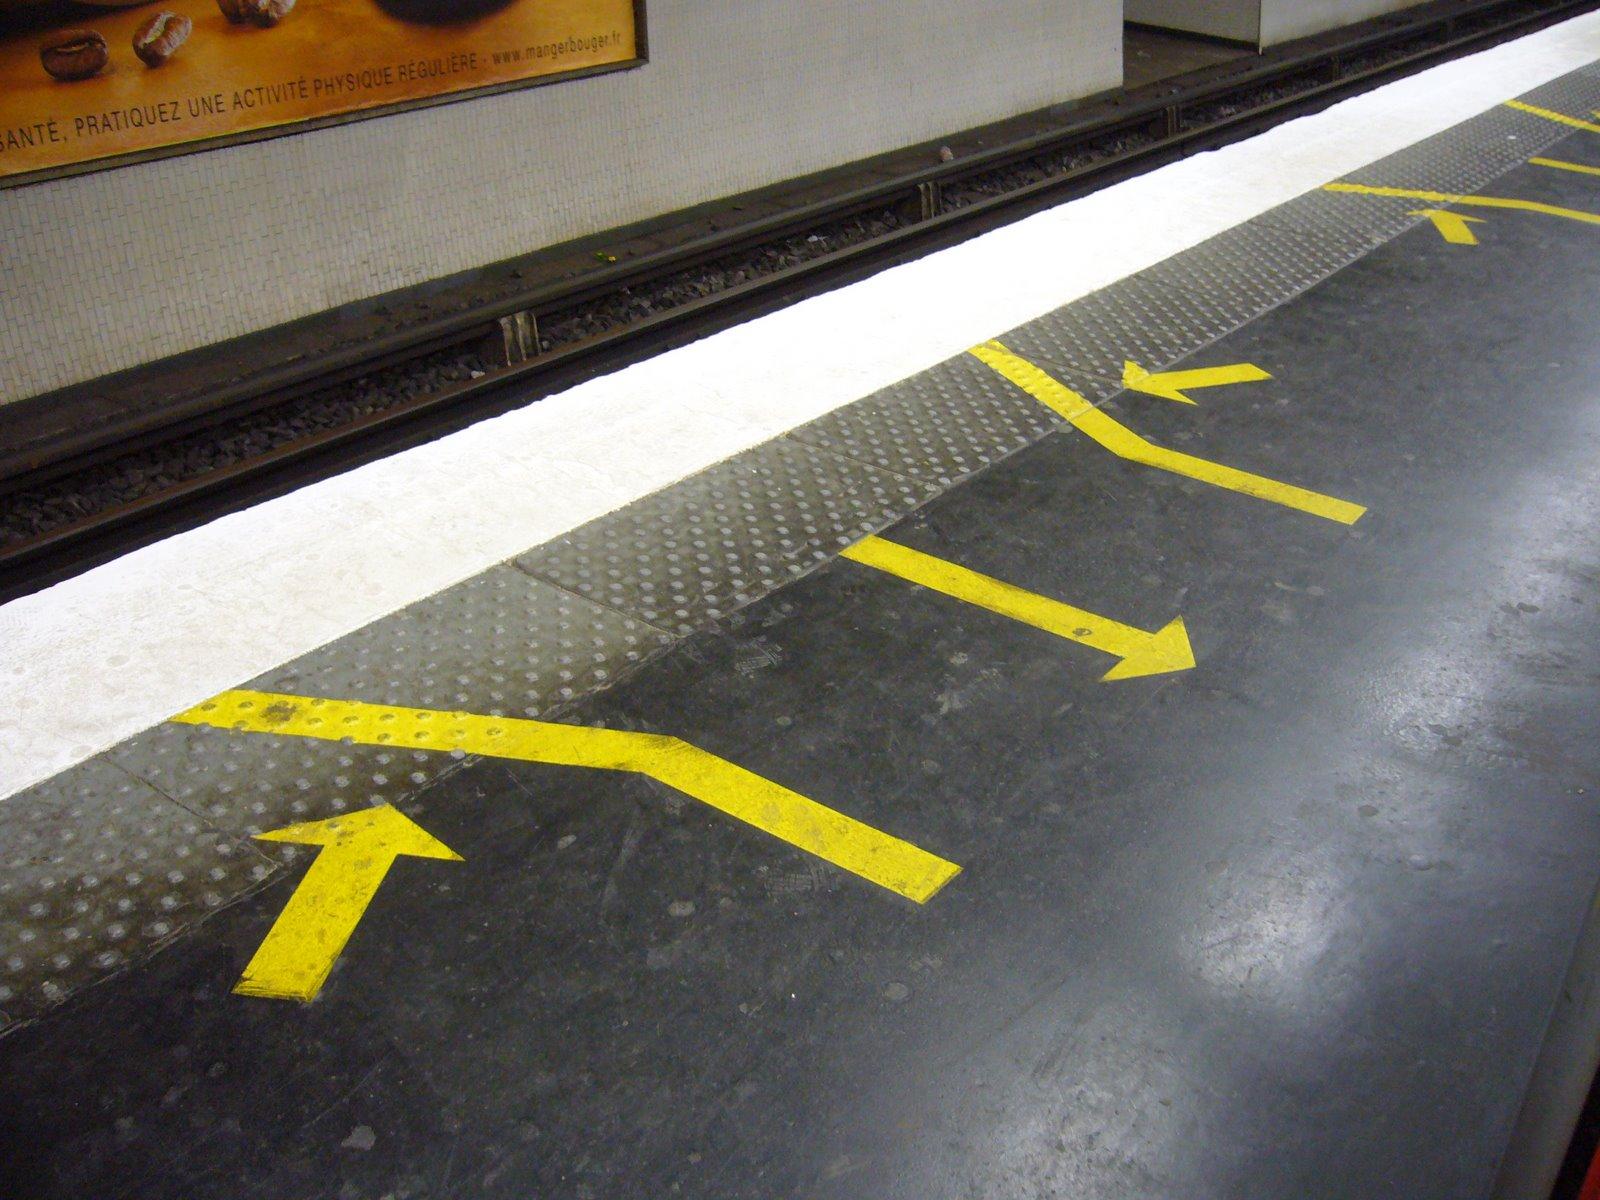 [Metro_Paris_-_Ligne_13_-_Station_Invalides.jpg]